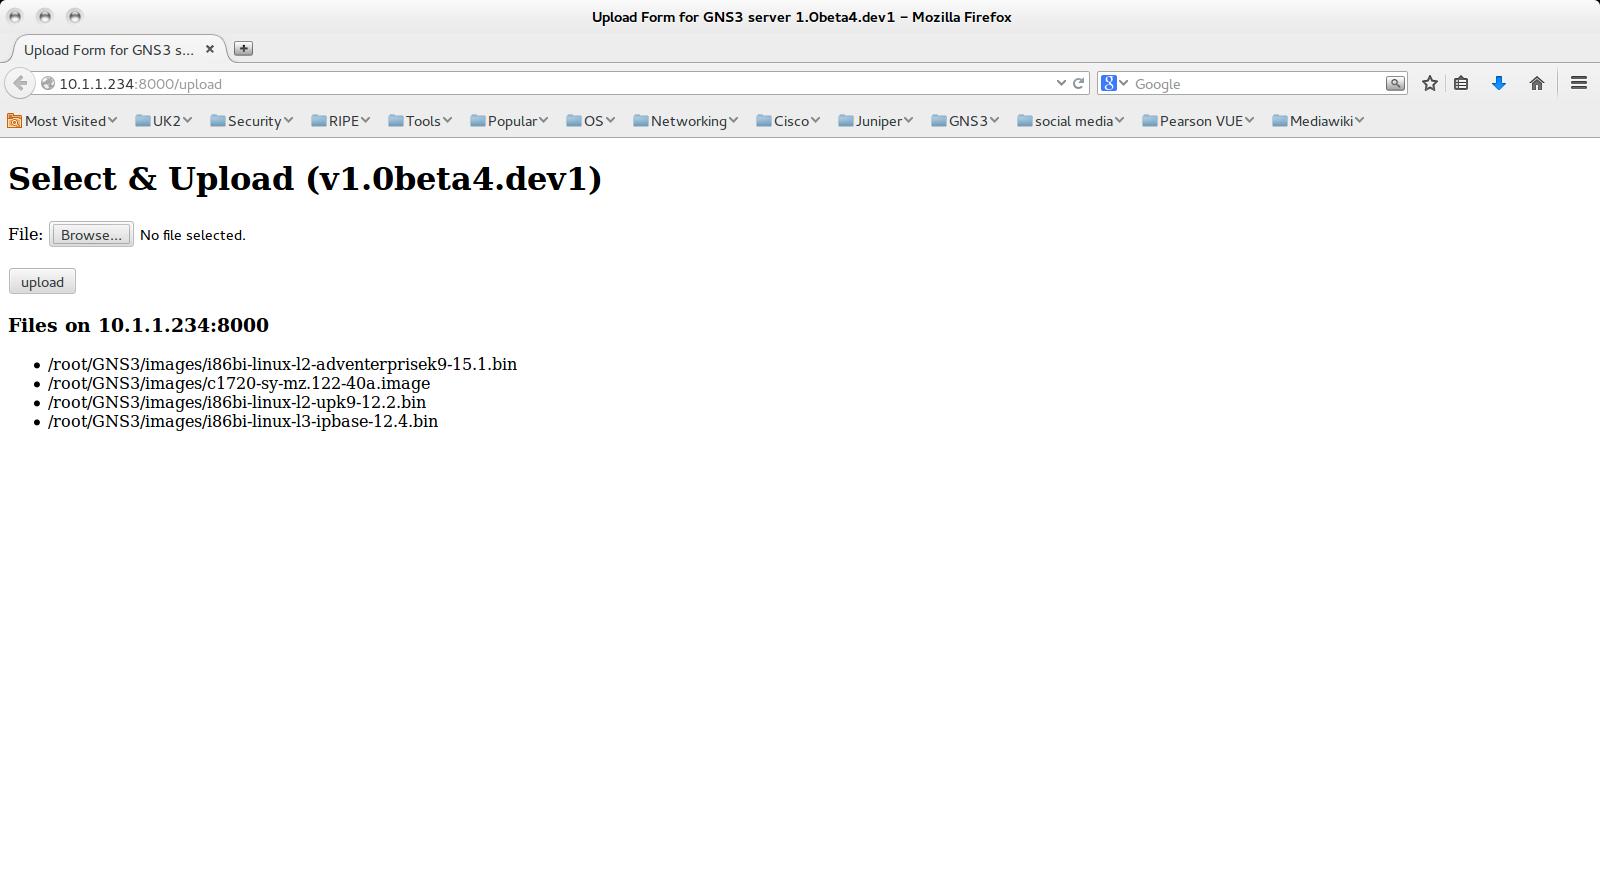 Upload Form for GNS3 server 1.0beta4.dev1 - Mozilla Firefox_019